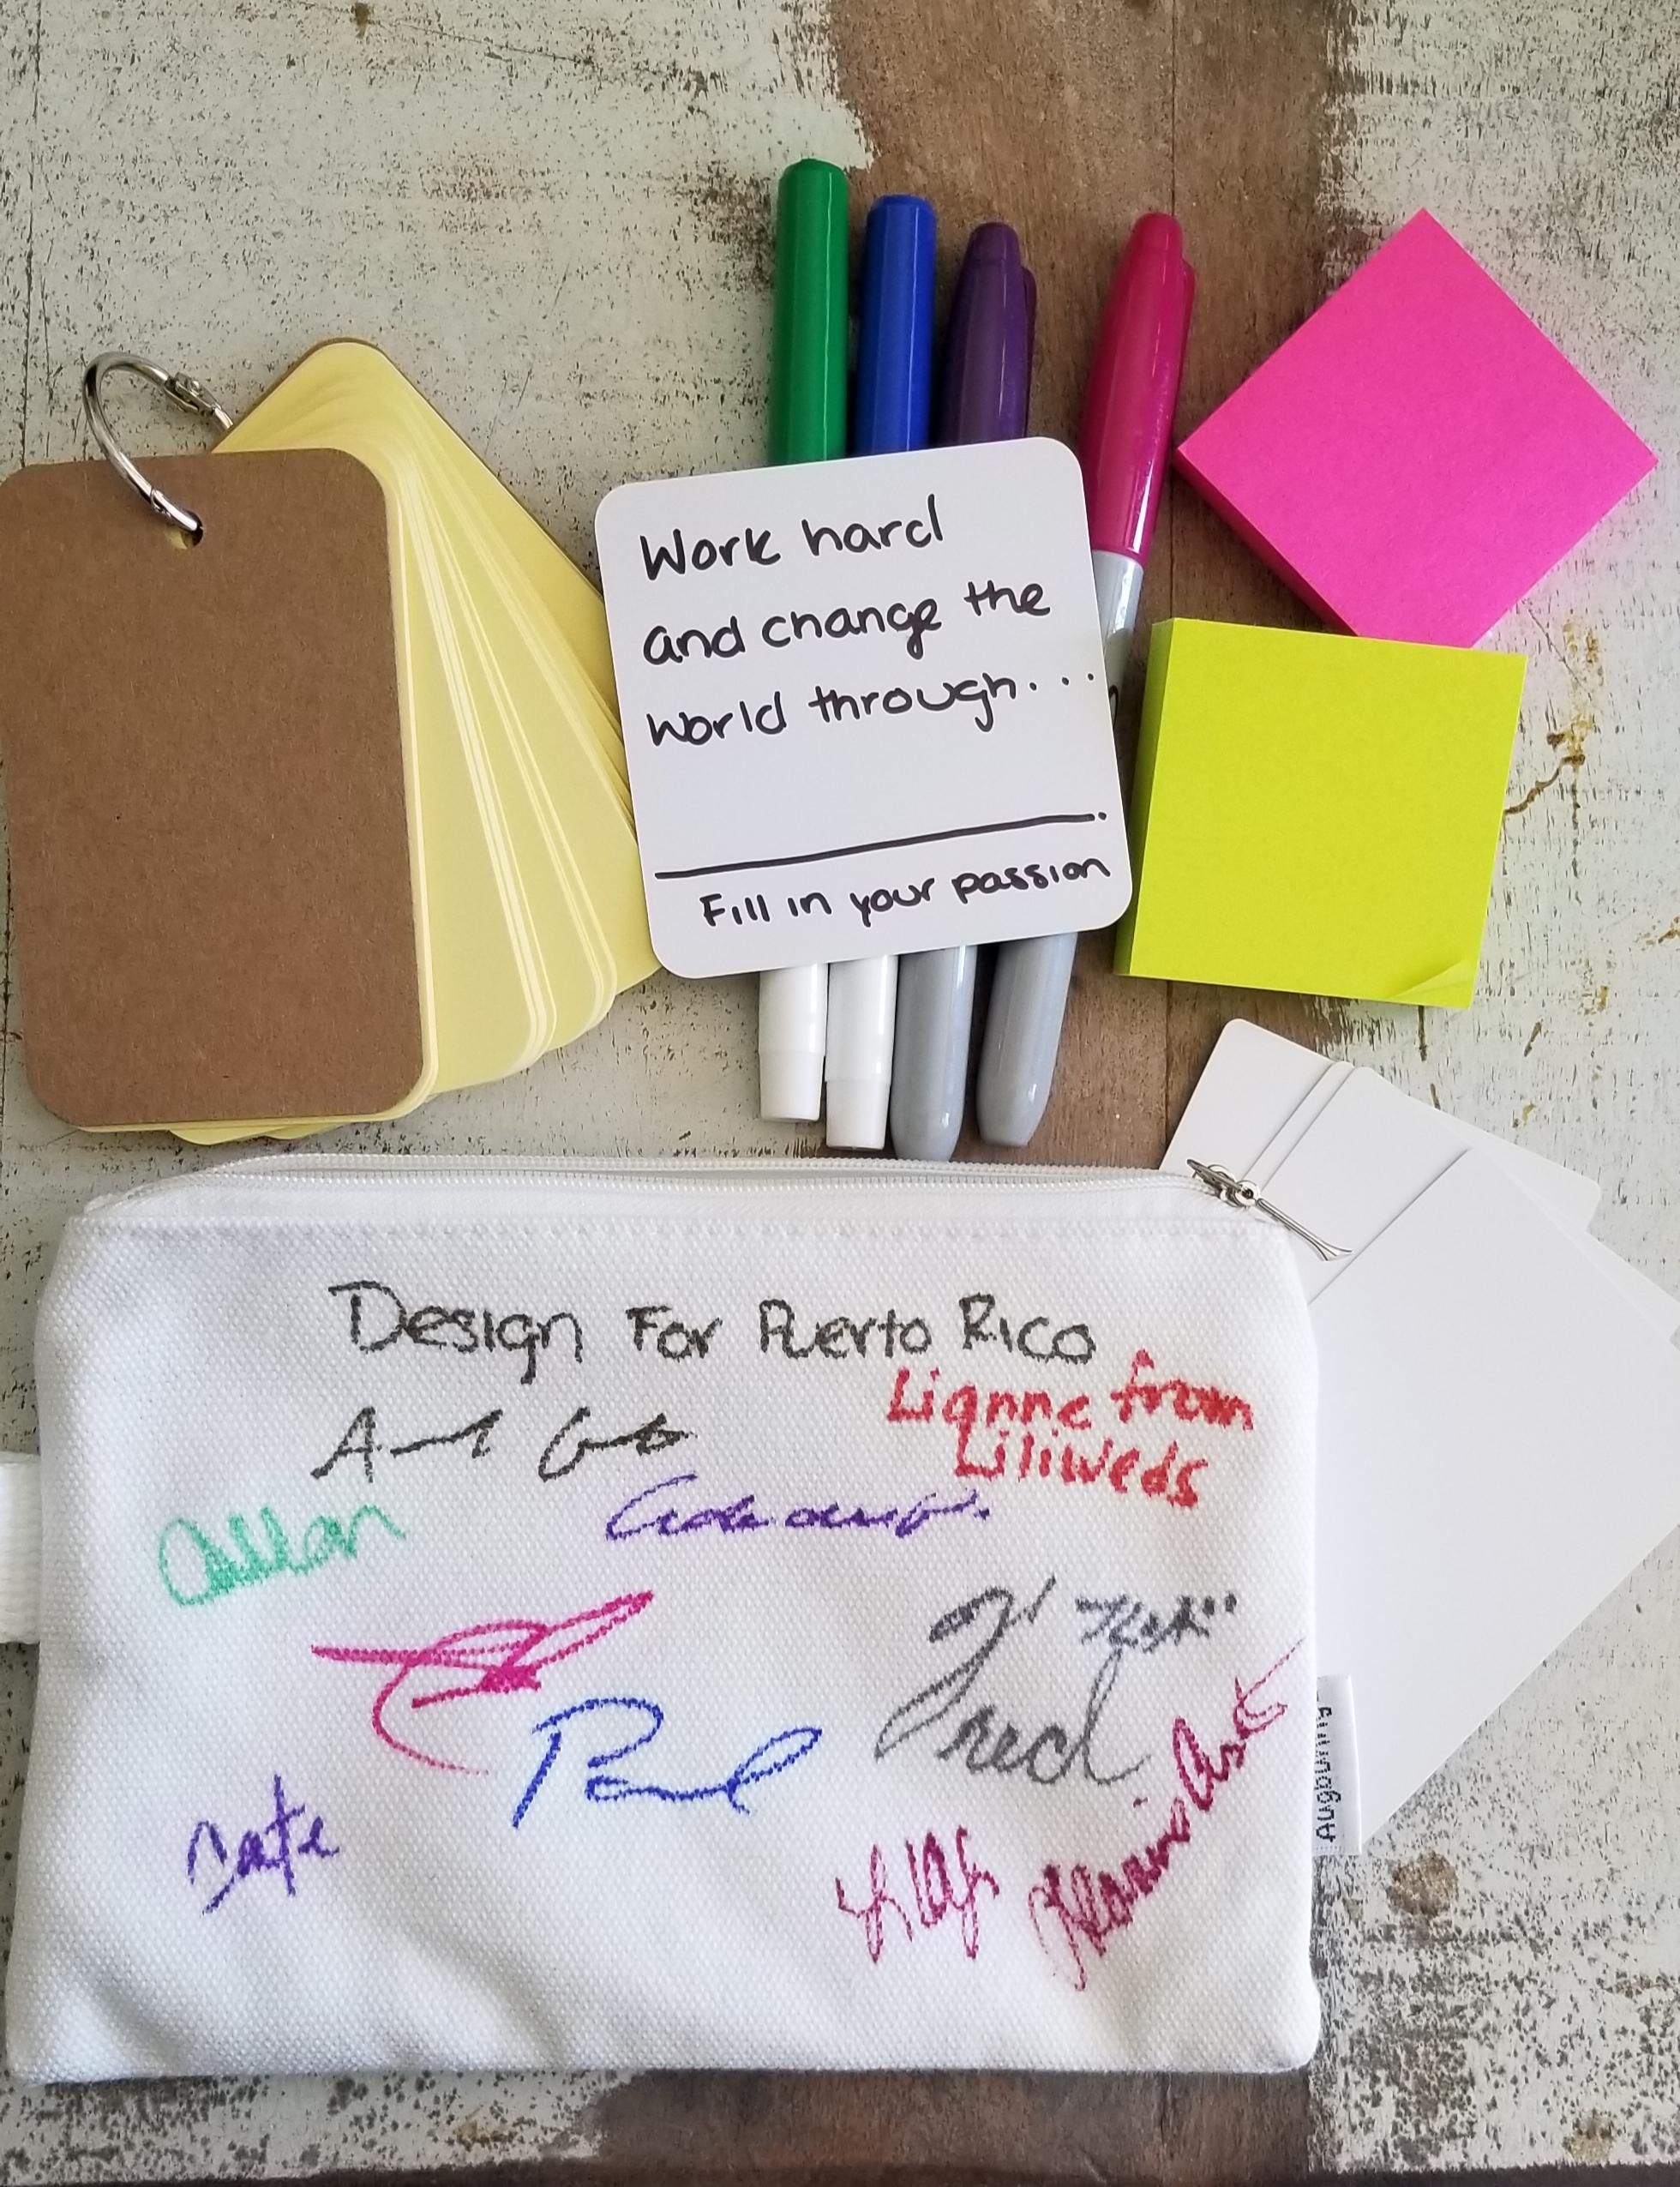 Design for Puerto: Strategic Design Thinking Workshop